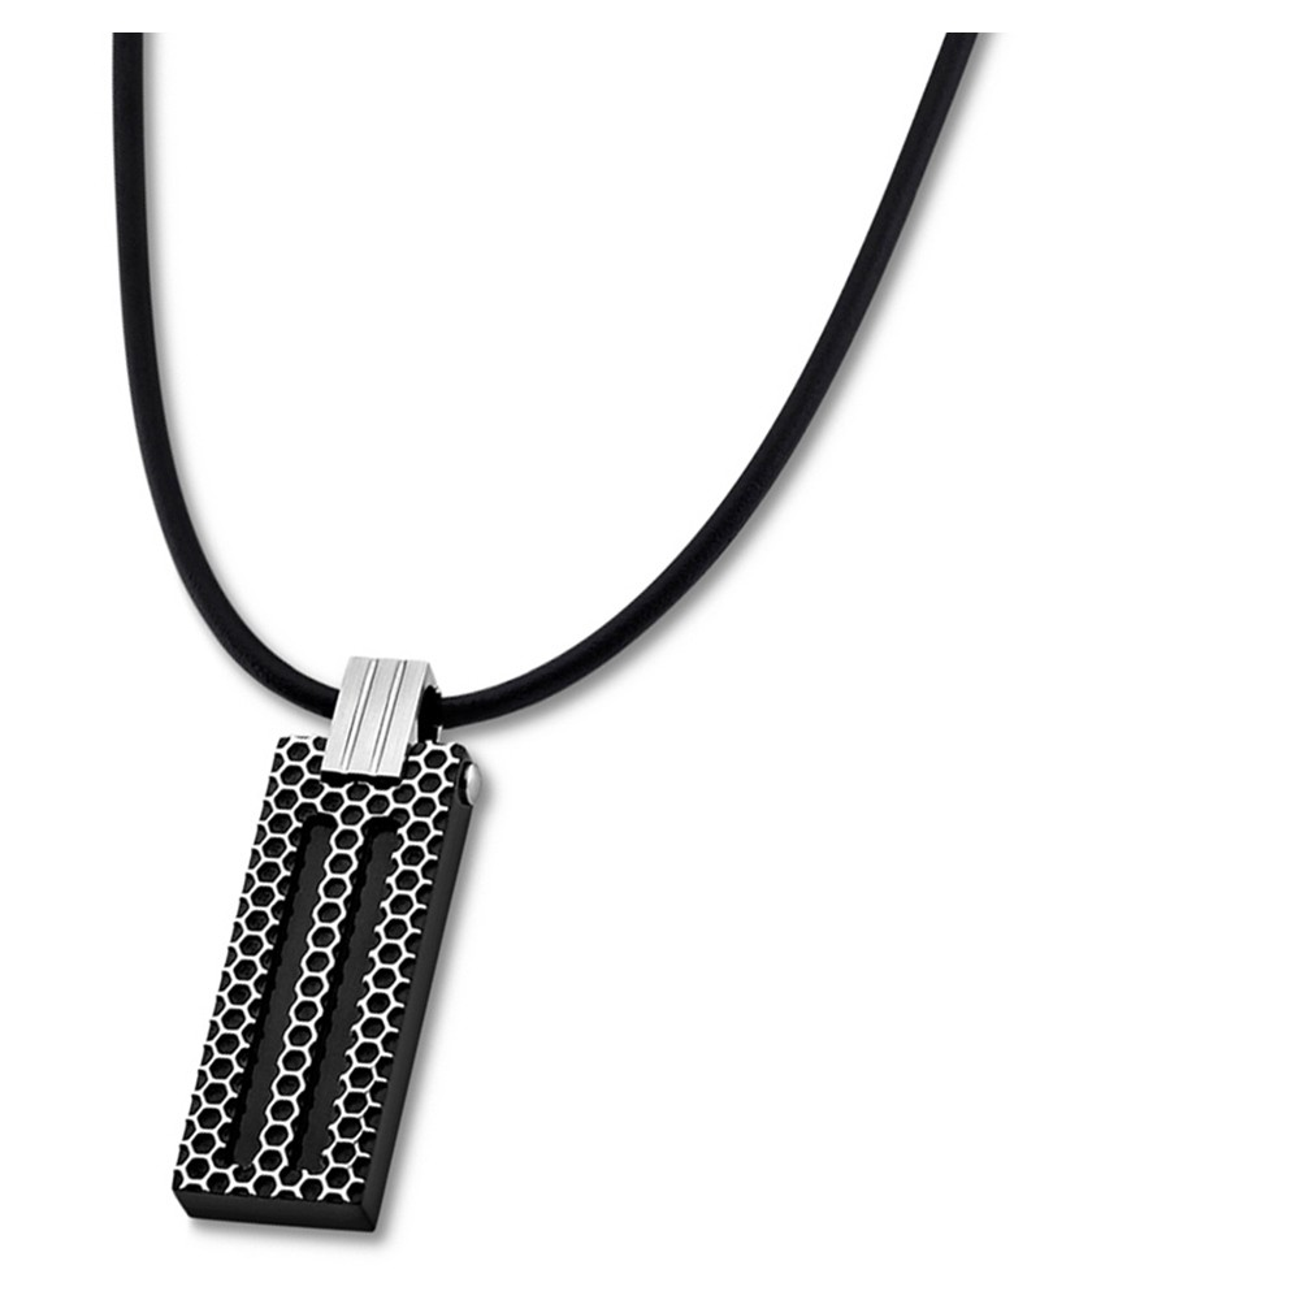 LOTUS Style Halskette Herren Edelstahl schwarz LS1797-1/4 Schmuck JLS1797-1-4